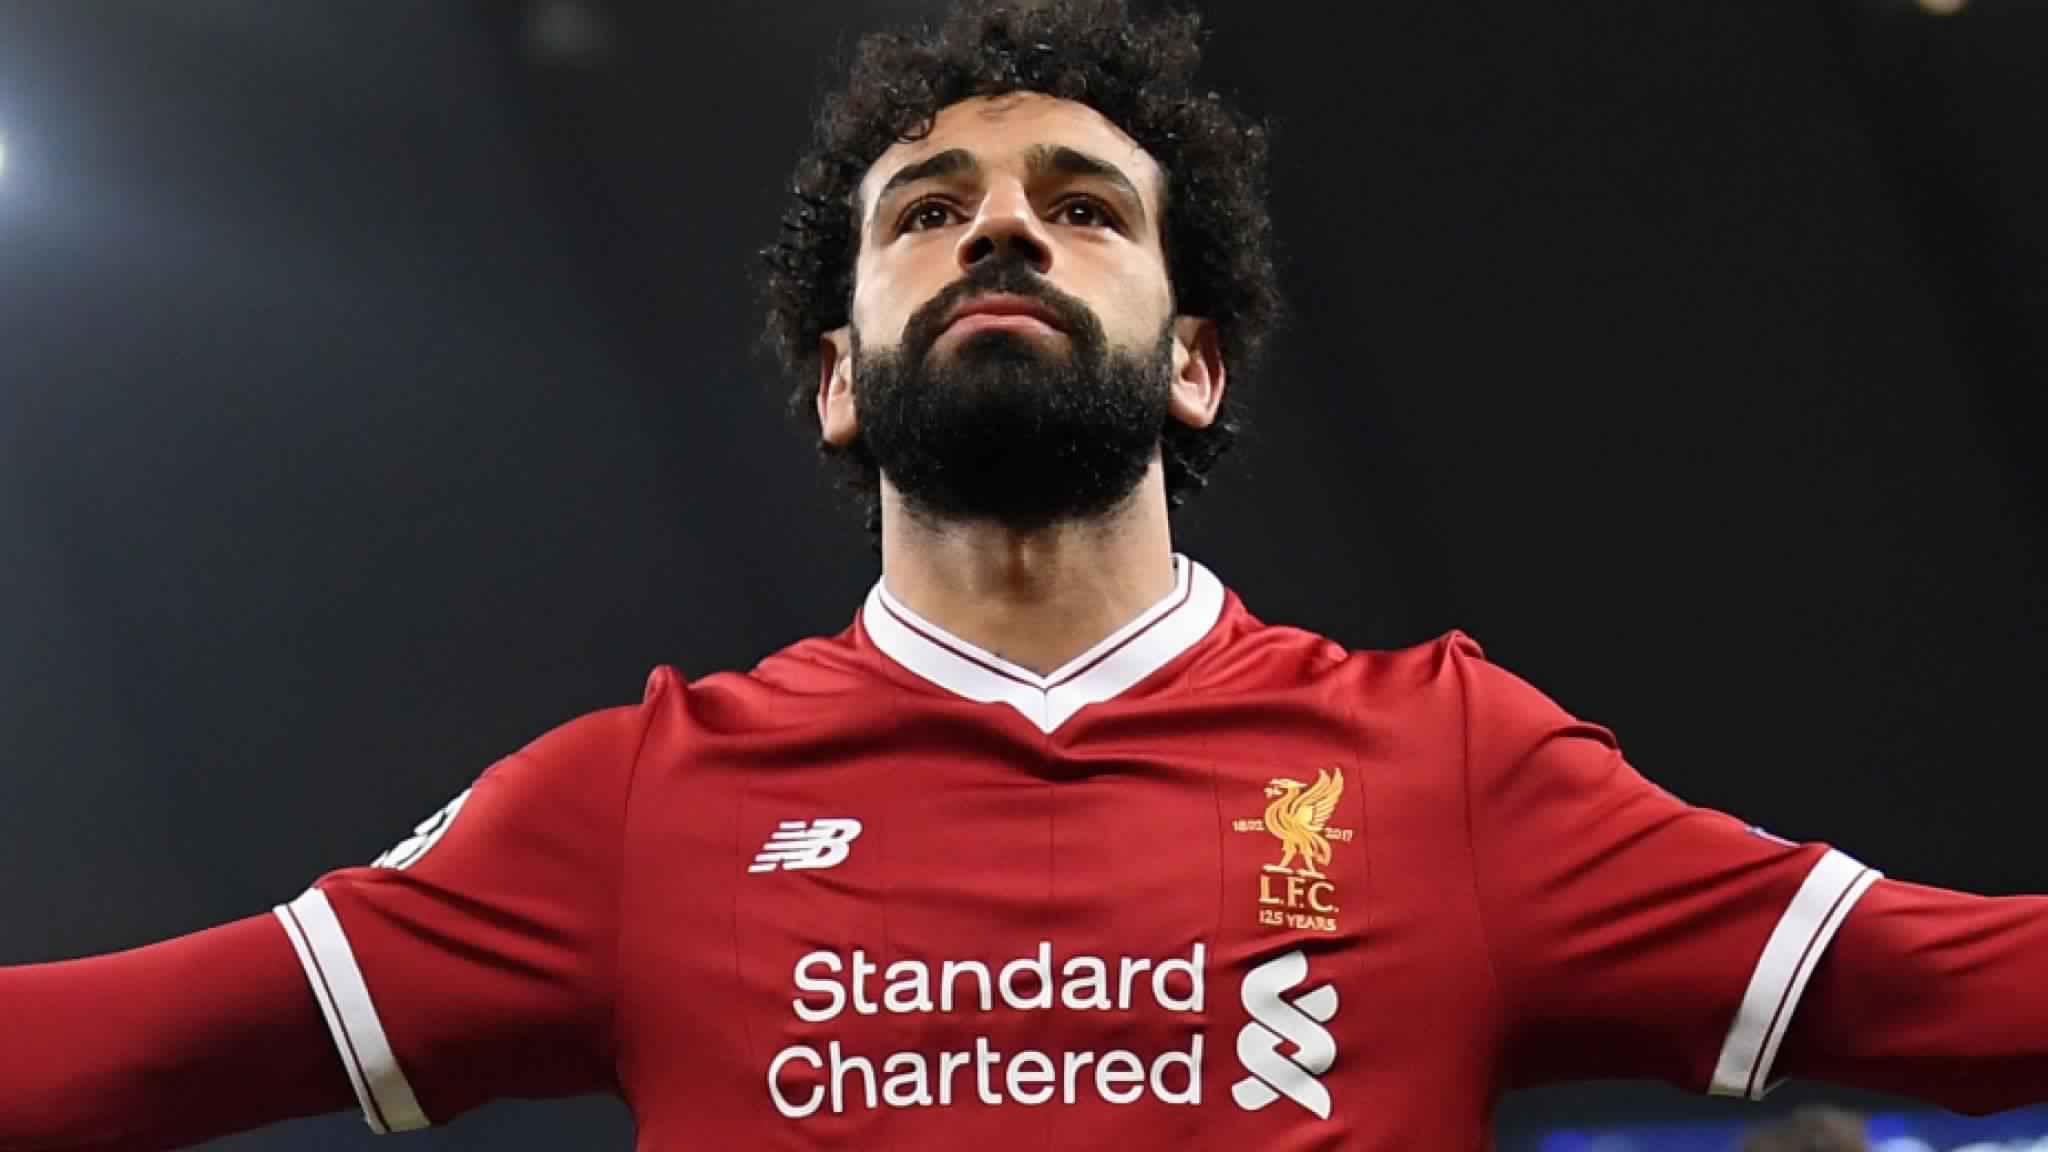 mohamed salah bilder9 - 11 Mohamed Salah Bilder